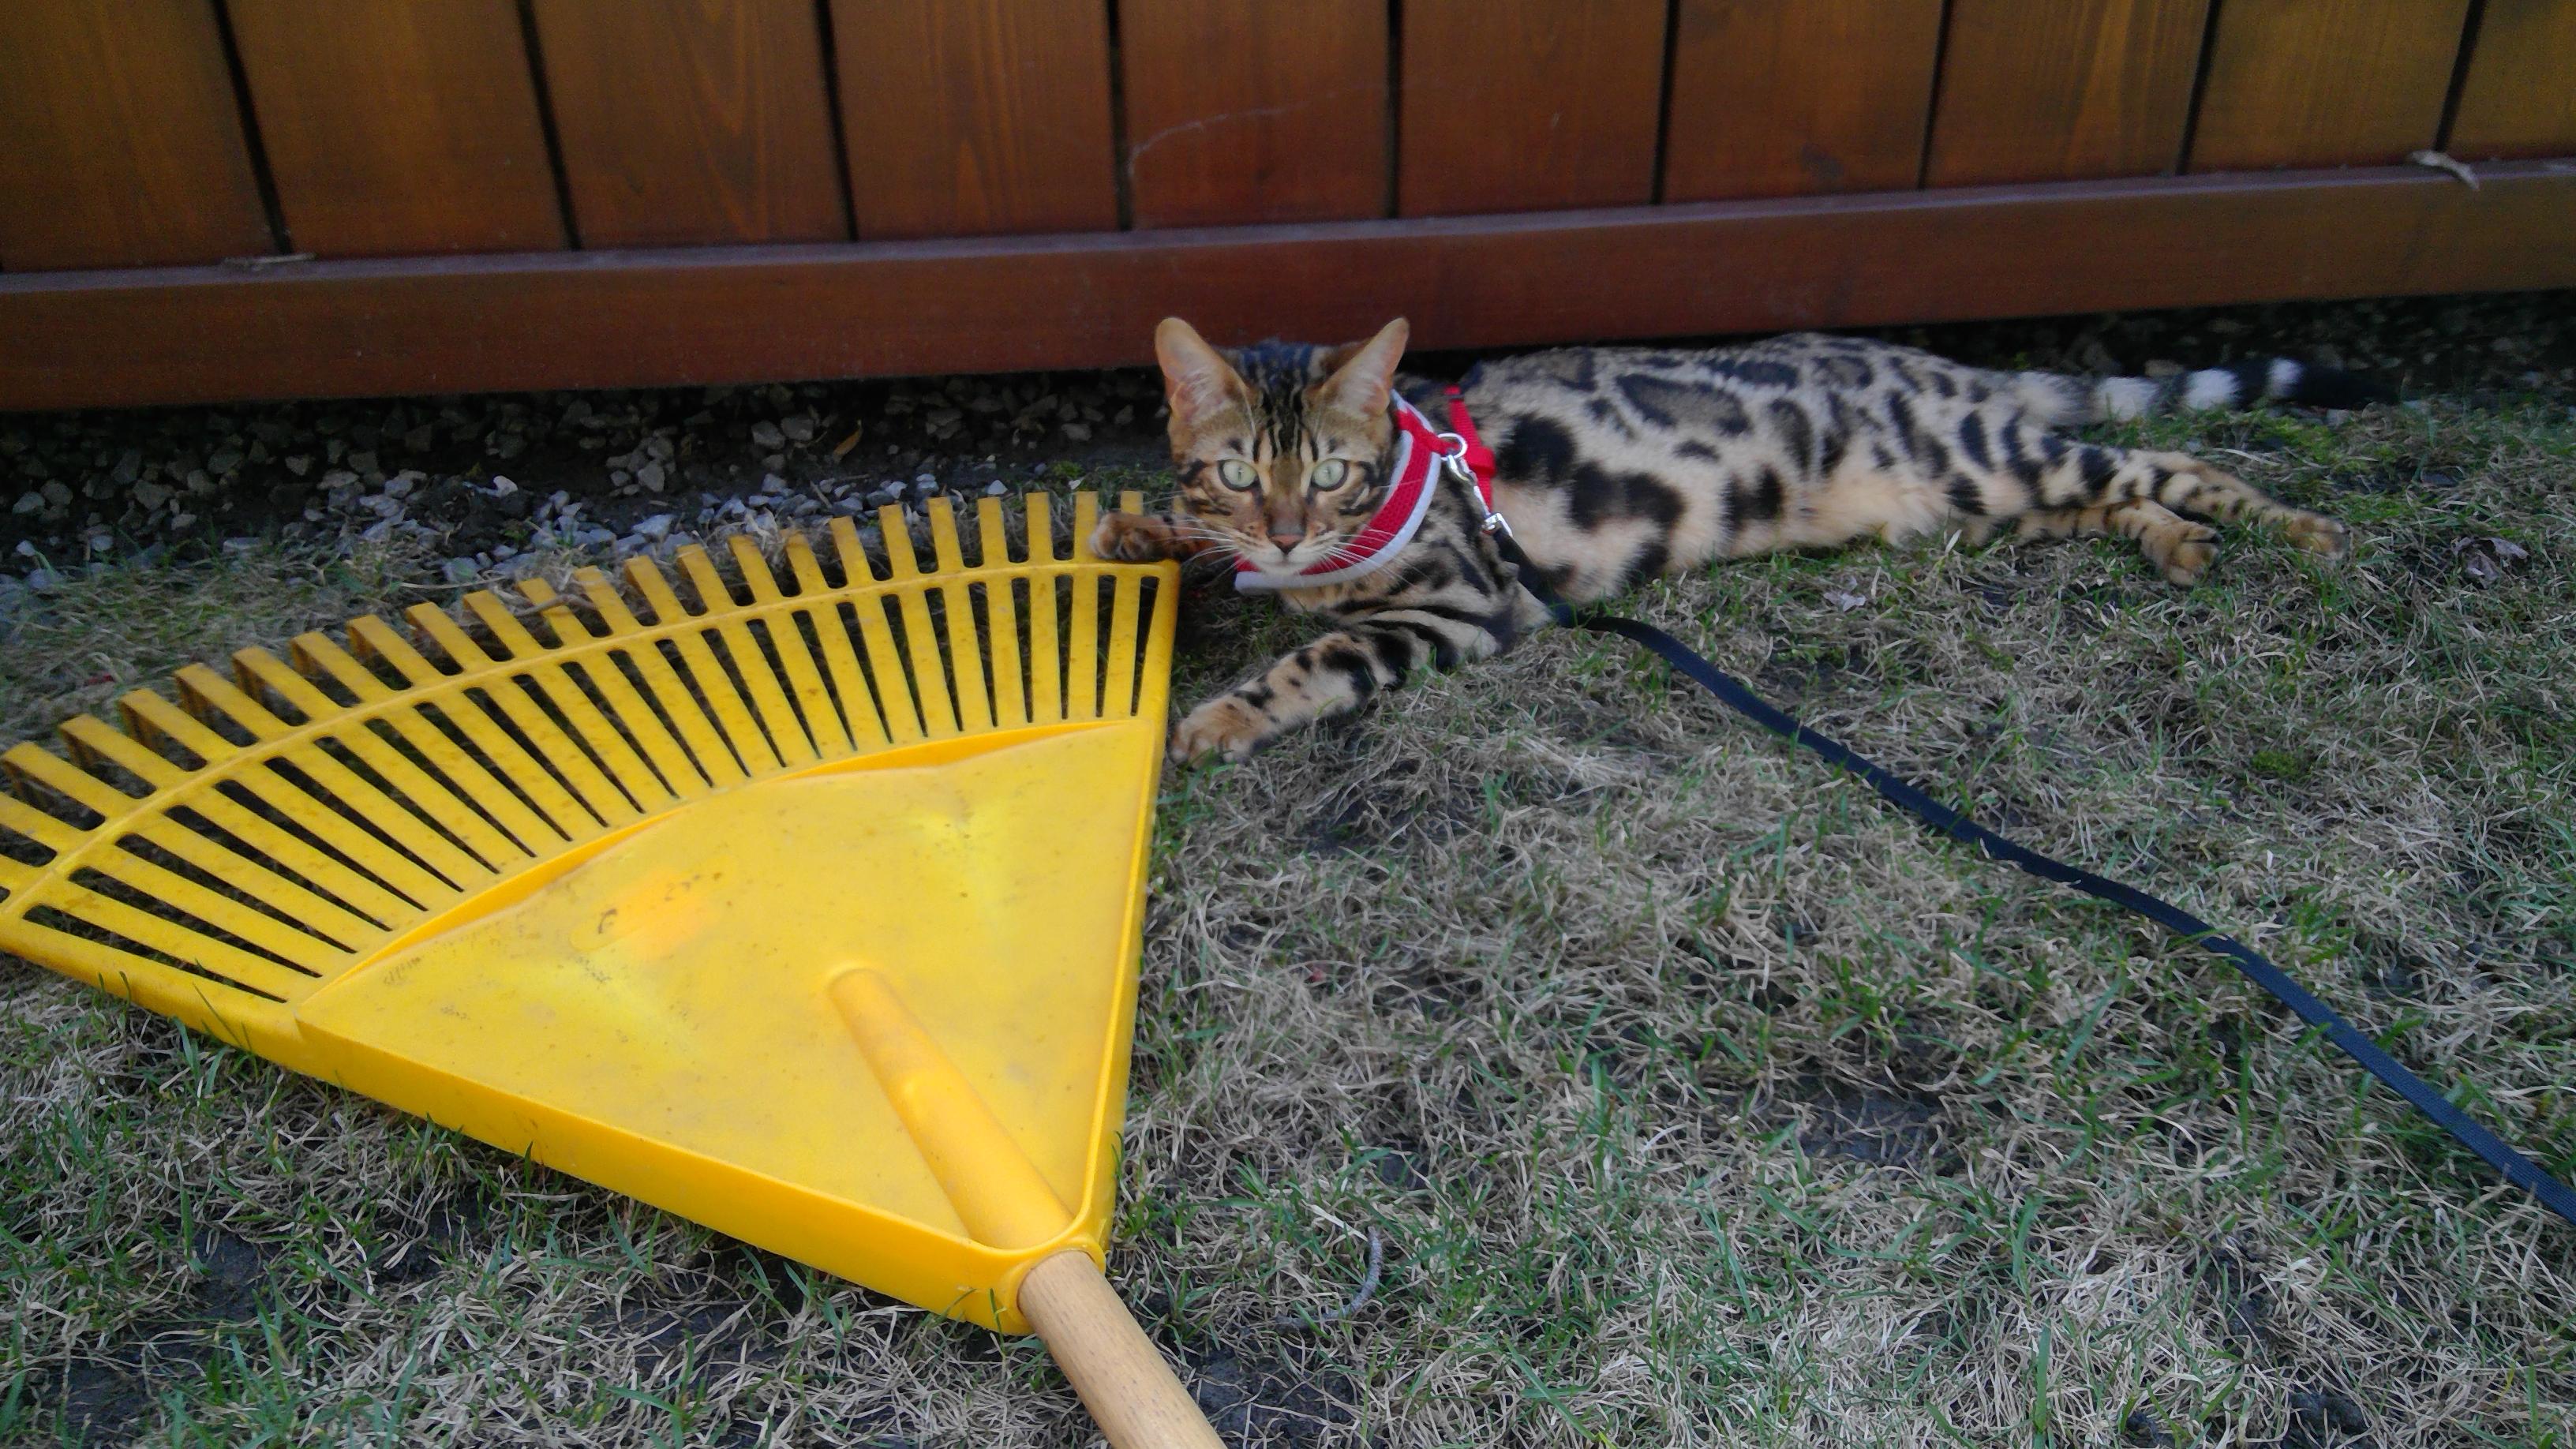 elle adore aller dehors